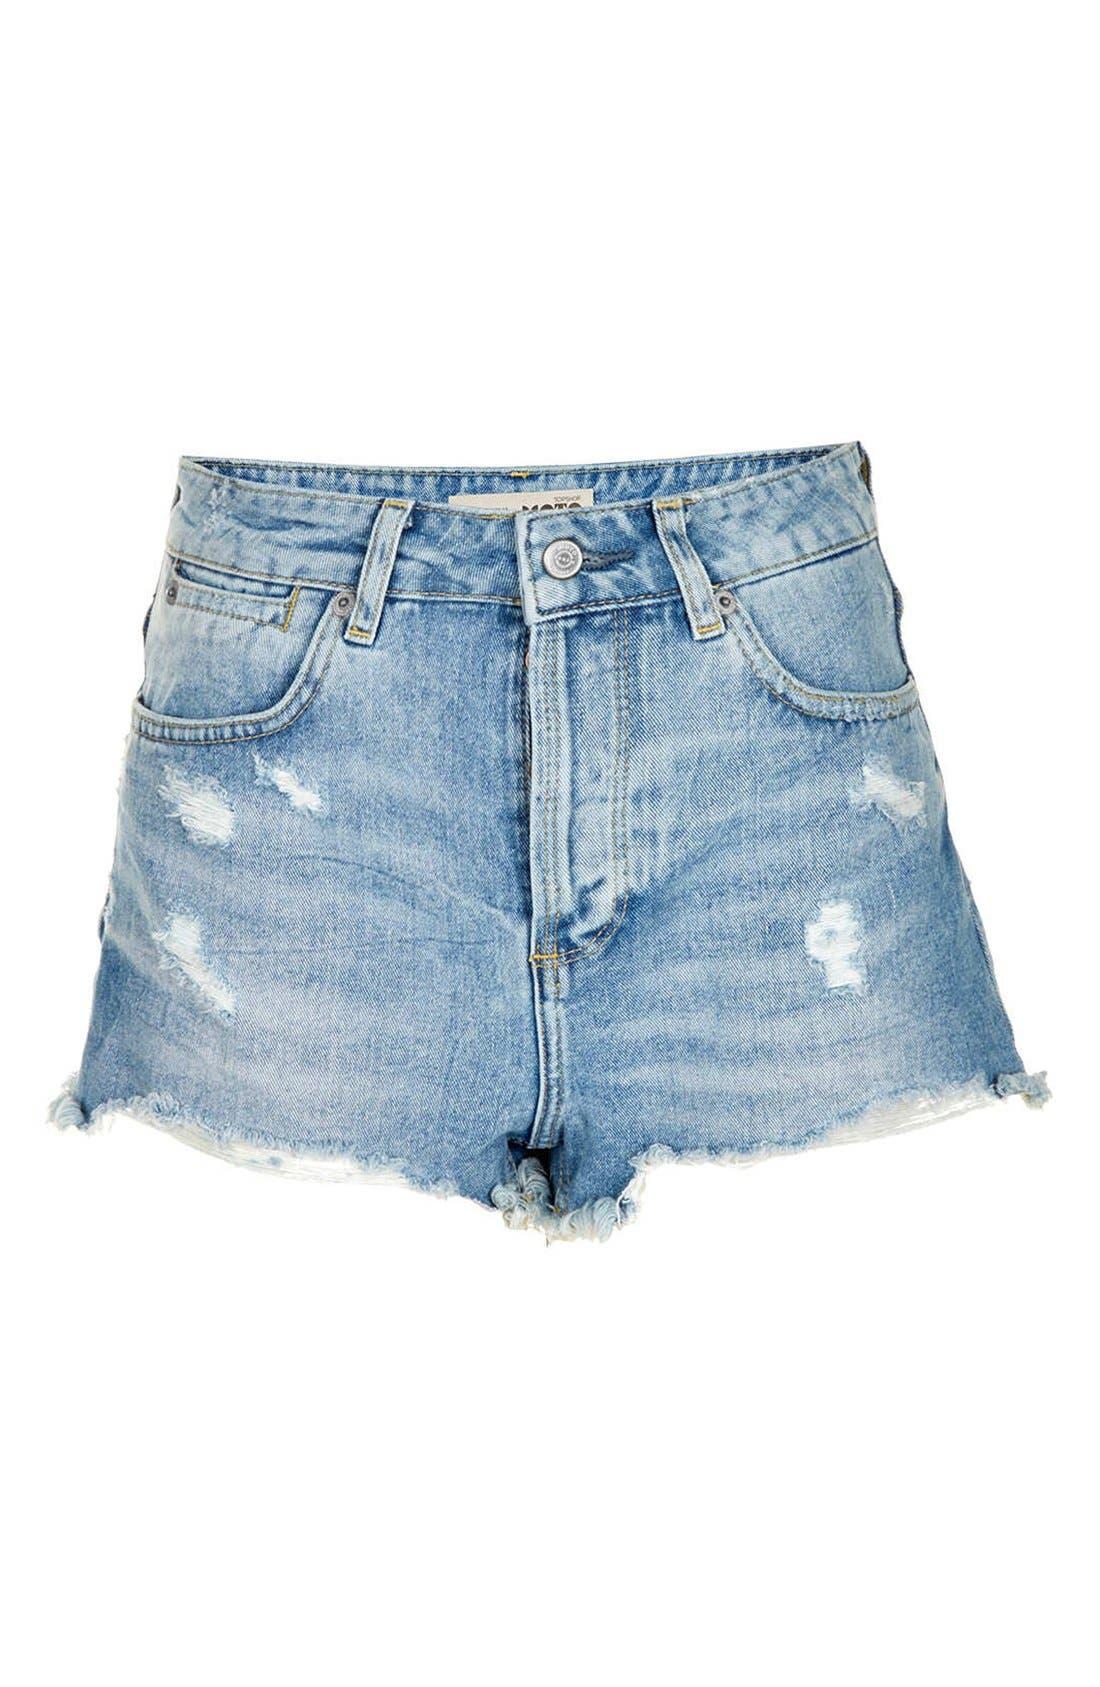 TOPSHOP,                             Moto 'Ruthie' Distressed Denim Shorts,                             Alternate thumbnail 4, color,                             420